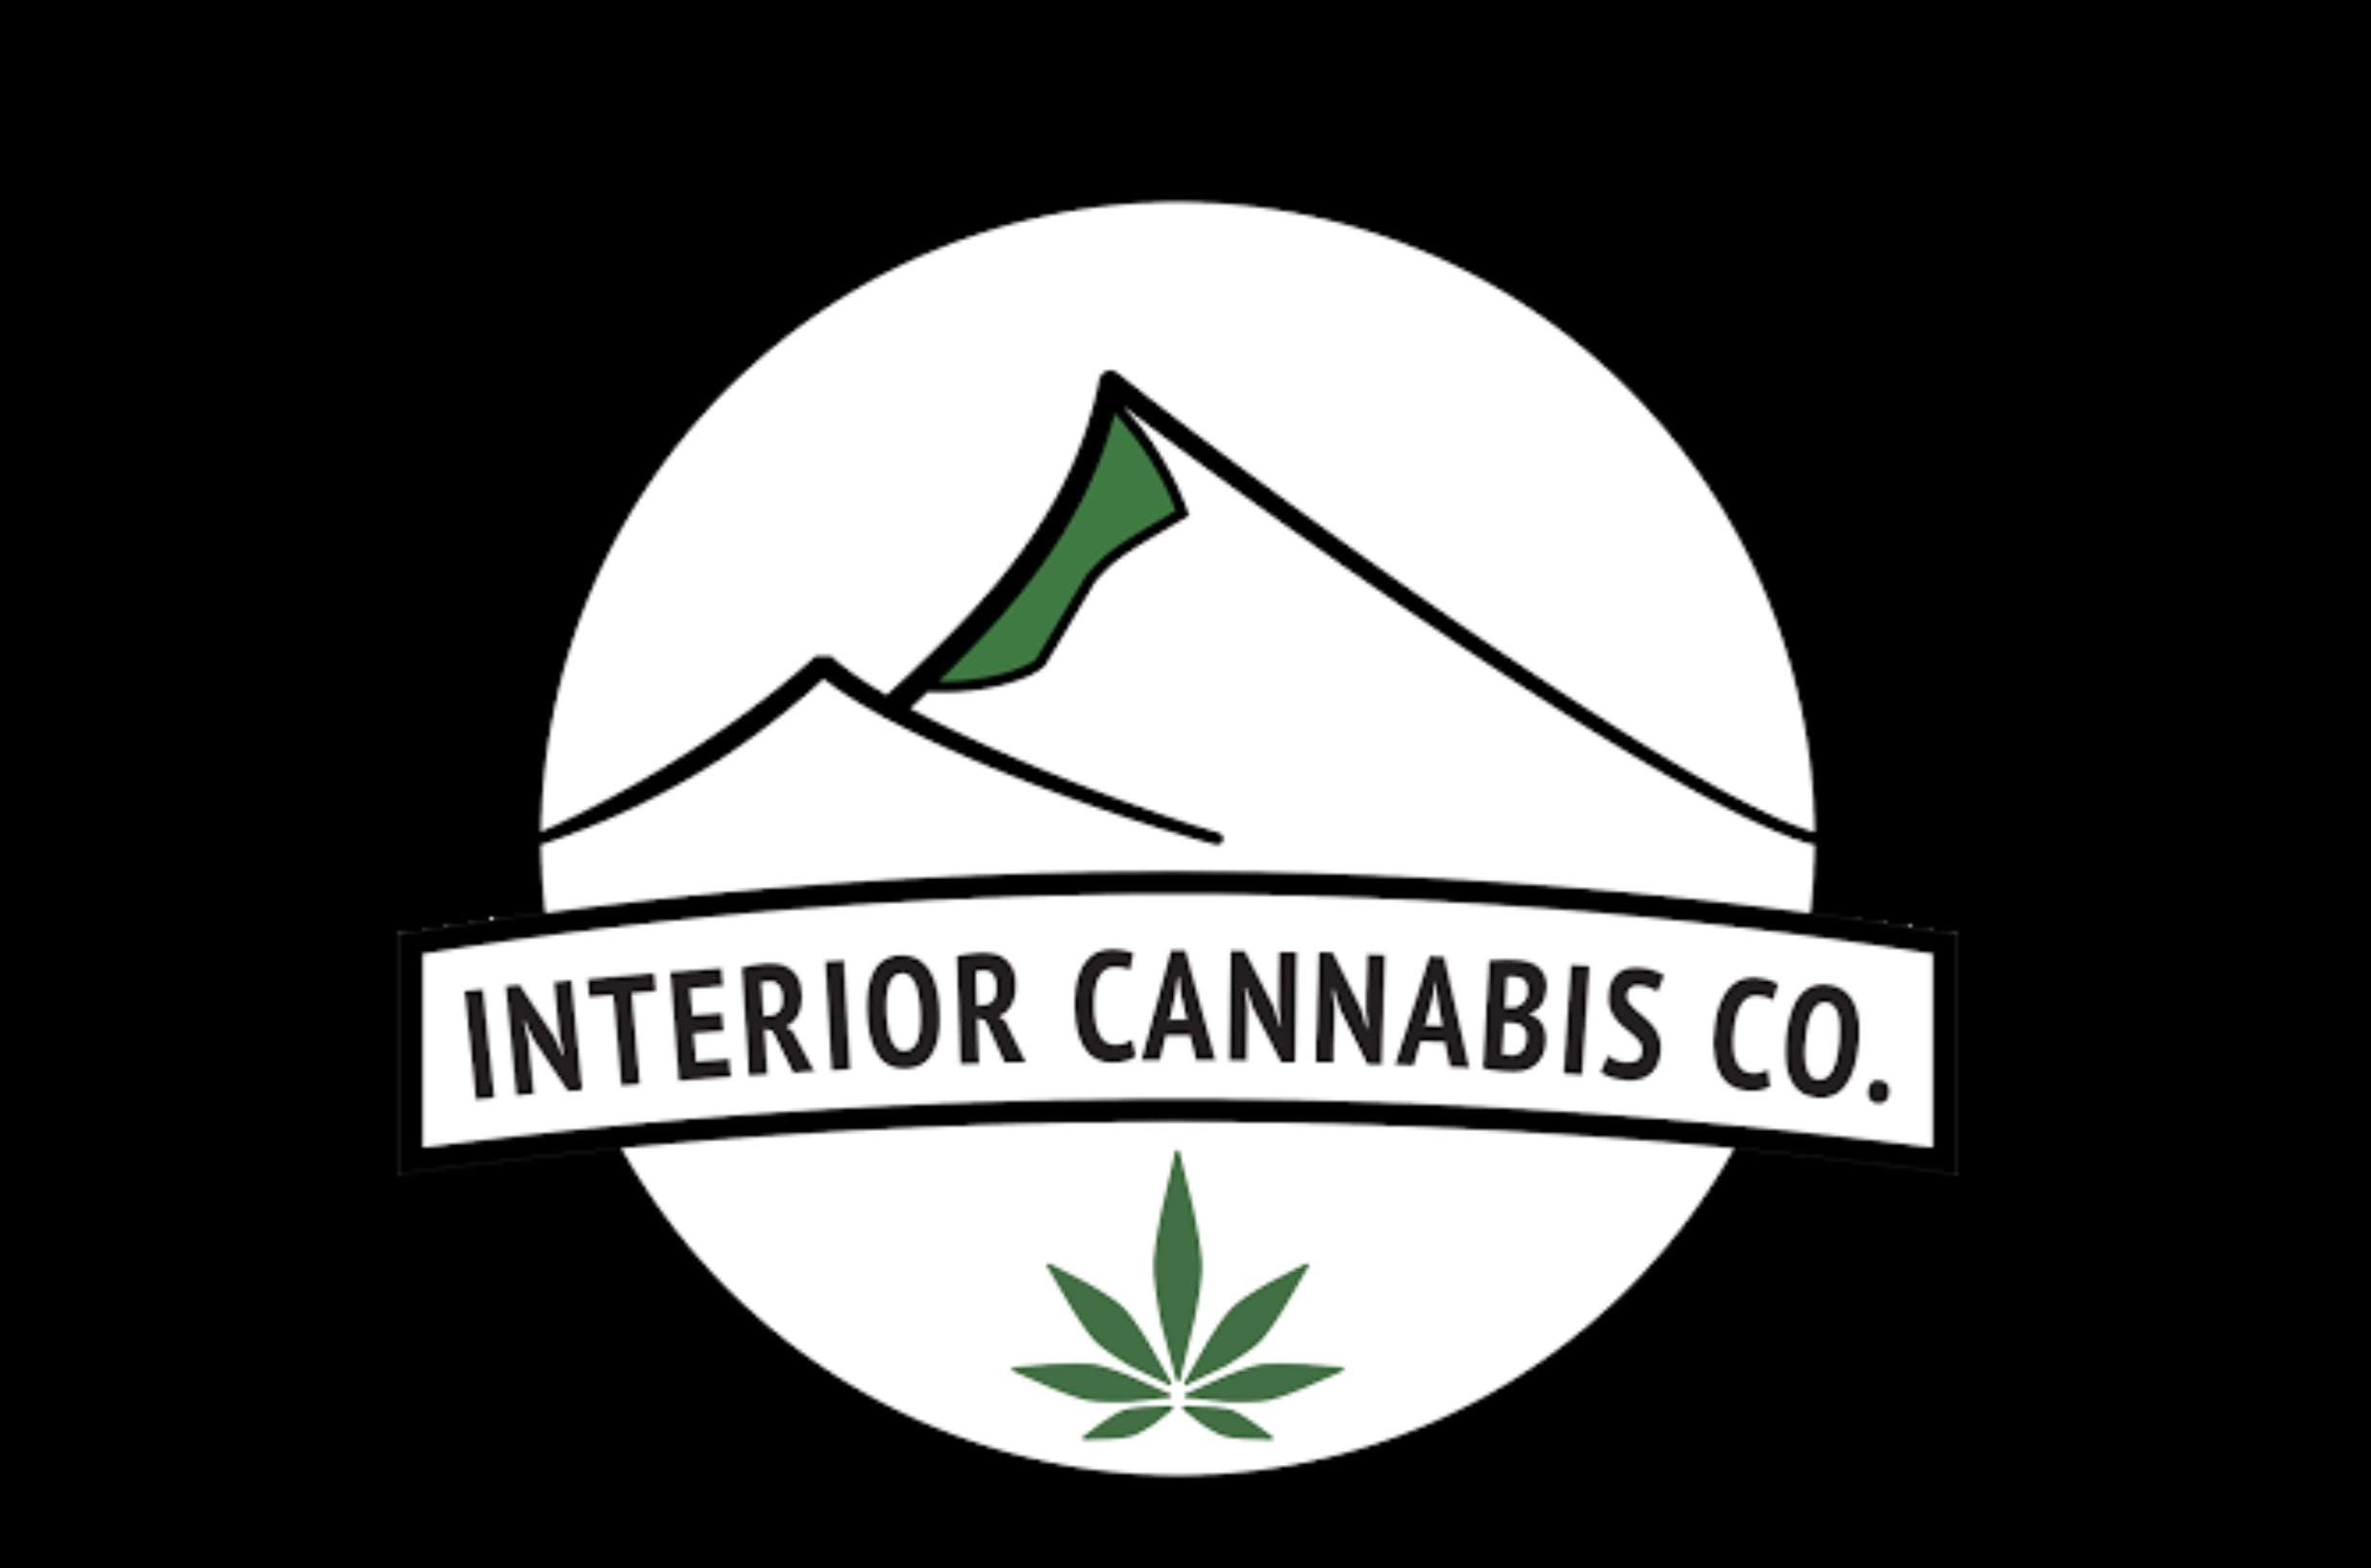 Interior Cannabis Company